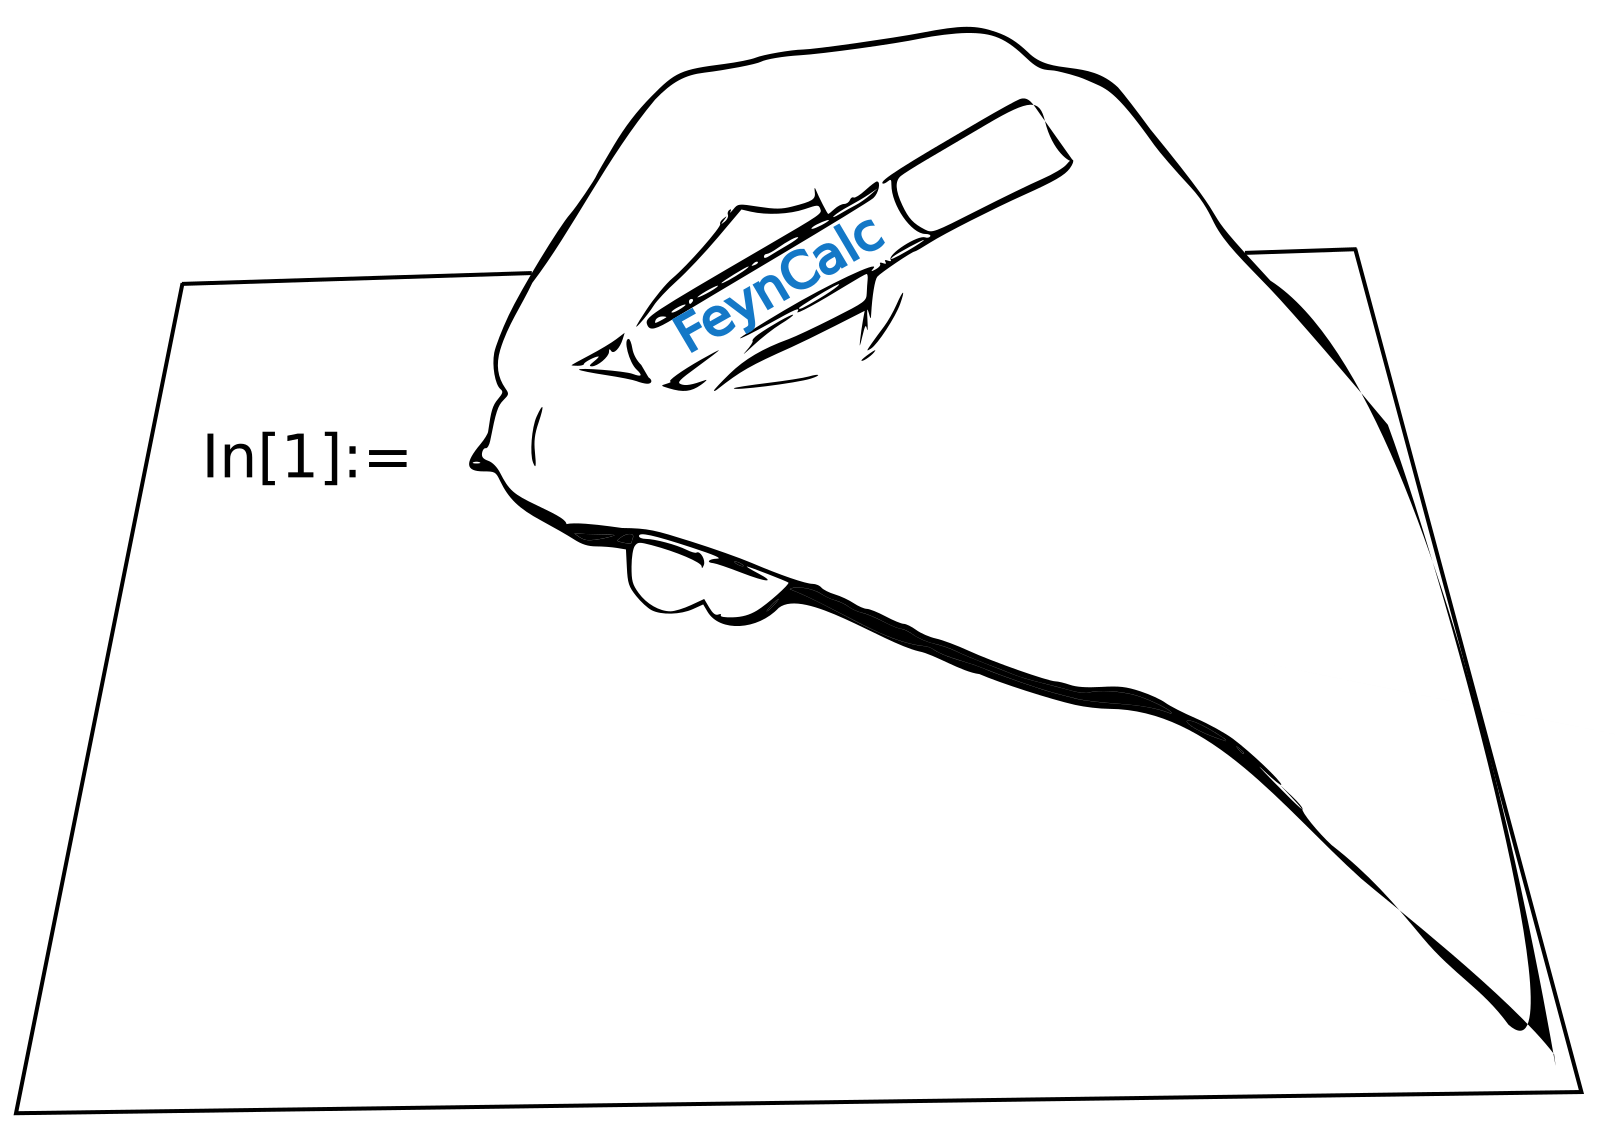 Handg logo pooptronica